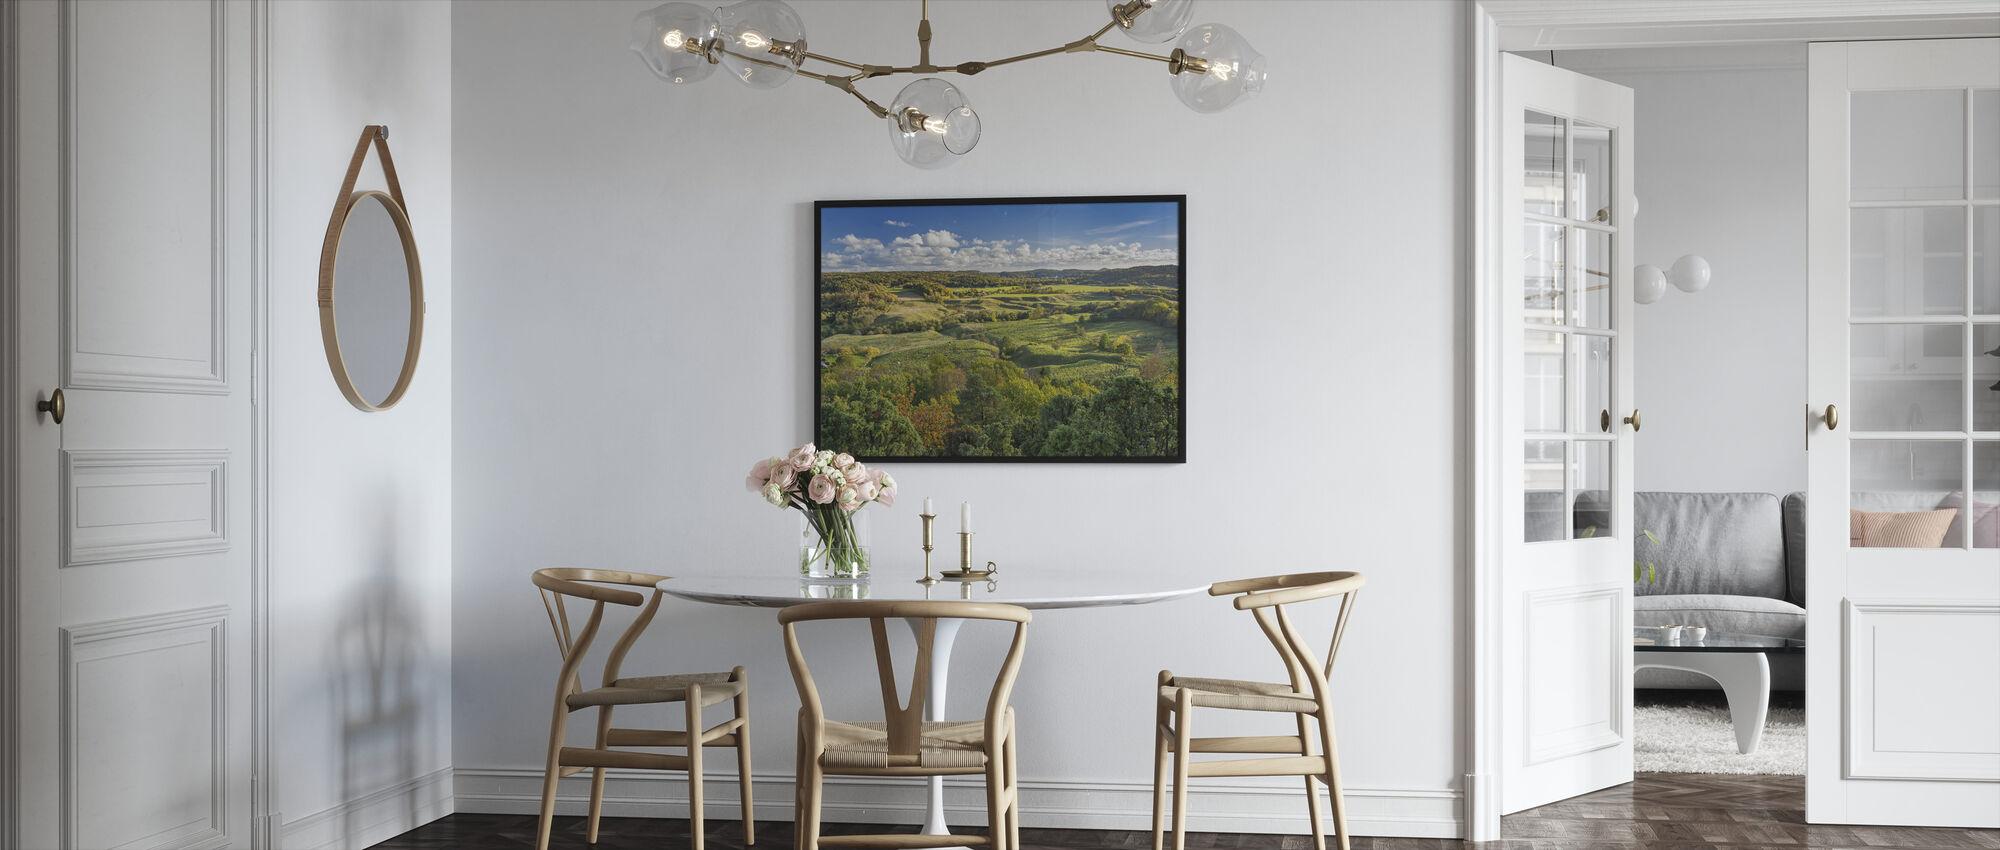 Öppet landsbygd i Sverige - Inramad tavla - Kök